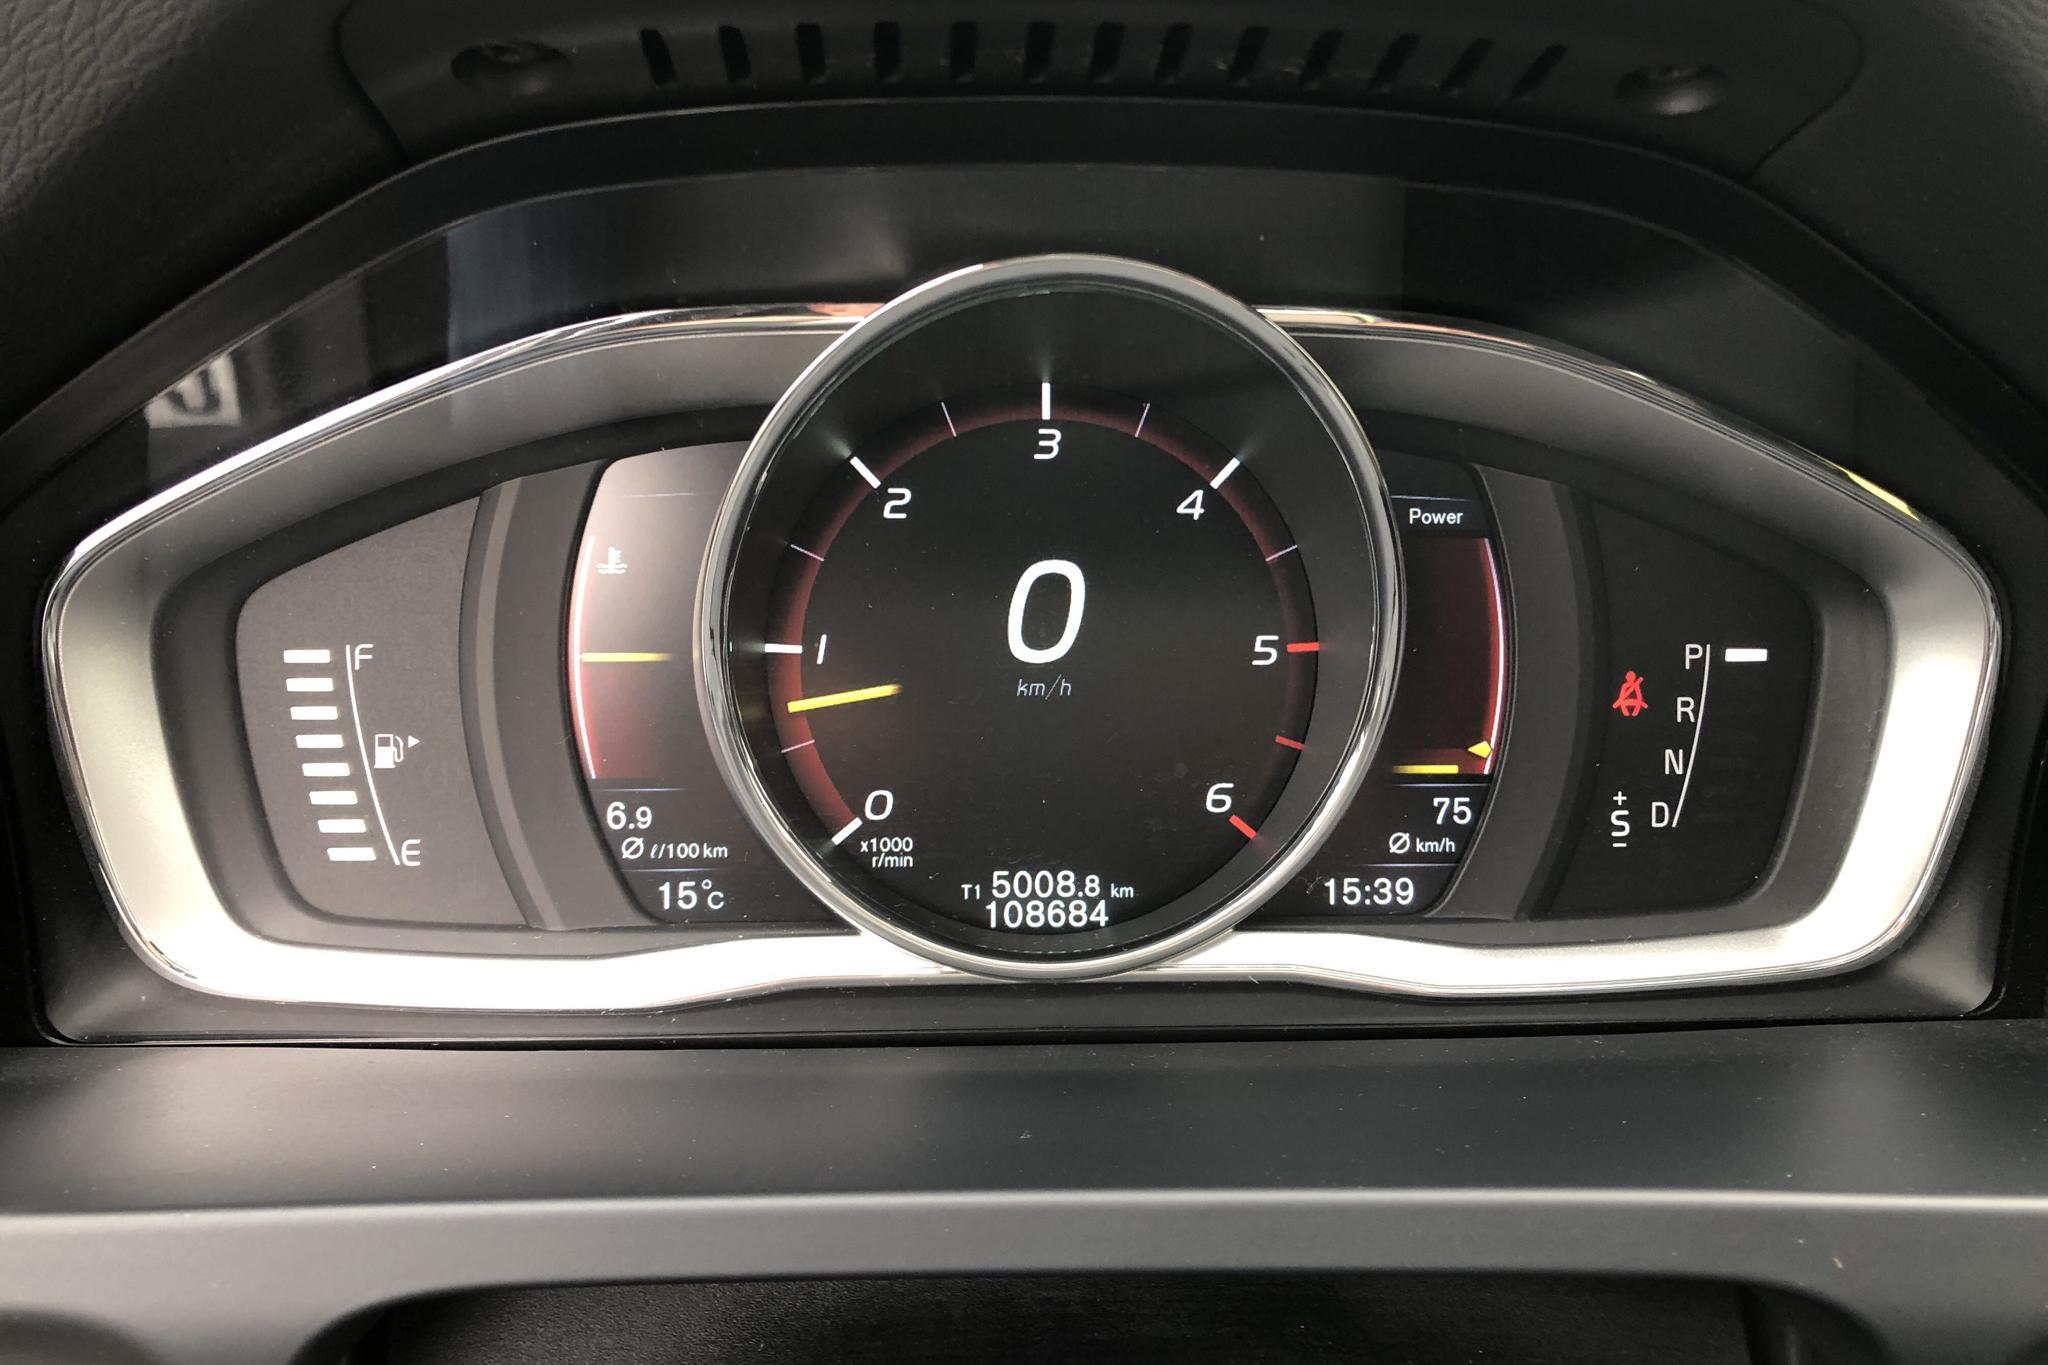 Volvo V60 D4 Cross Country AWD (190hk) - 10 869 mil - Automat - vit - 2016